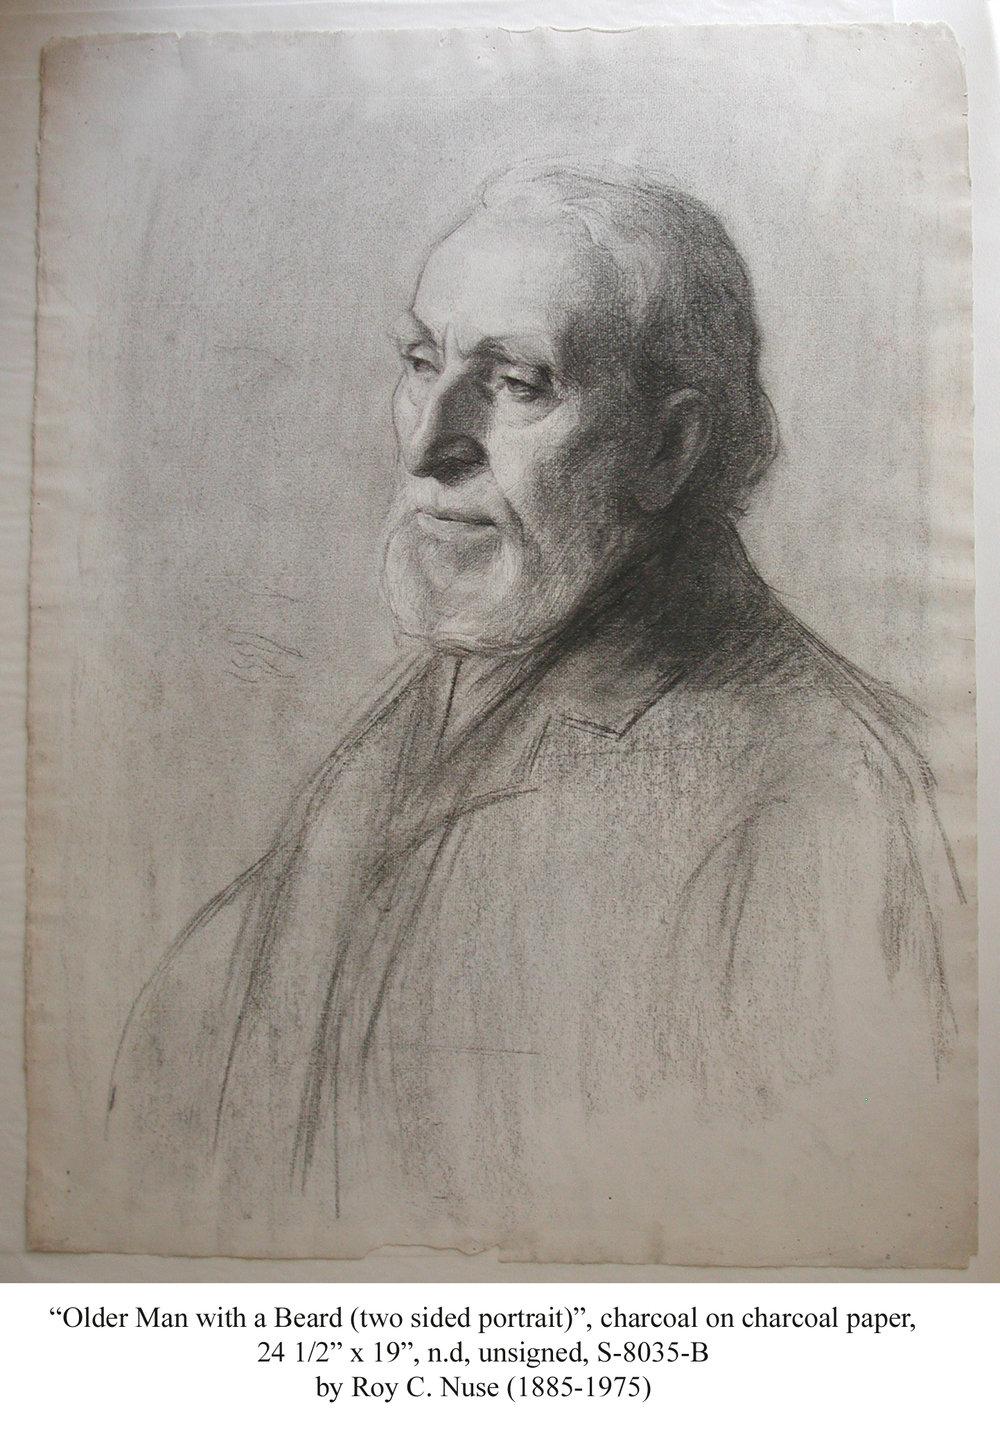 Older Man with a Beard, S-8035-B copy.jpg